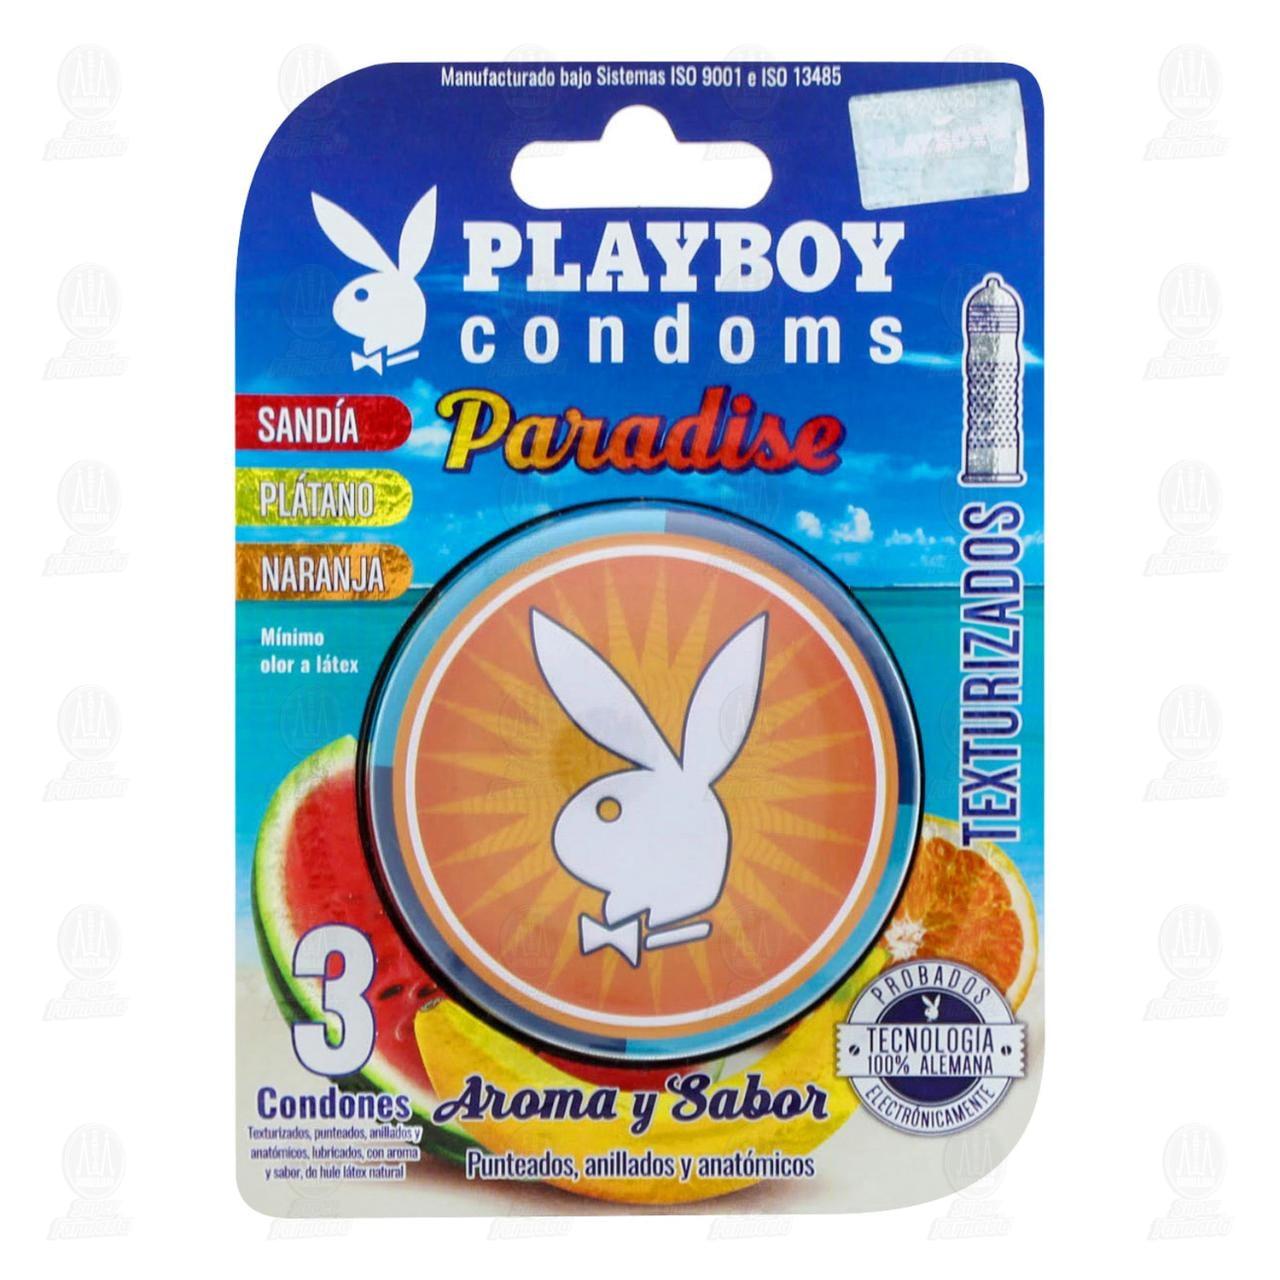 comprar https://www.movil.farmaciasguadalajara.com/wcsstore/FGCAS/wcs/products/1249606_S_1280_F.jpg en farmacias guadalajara